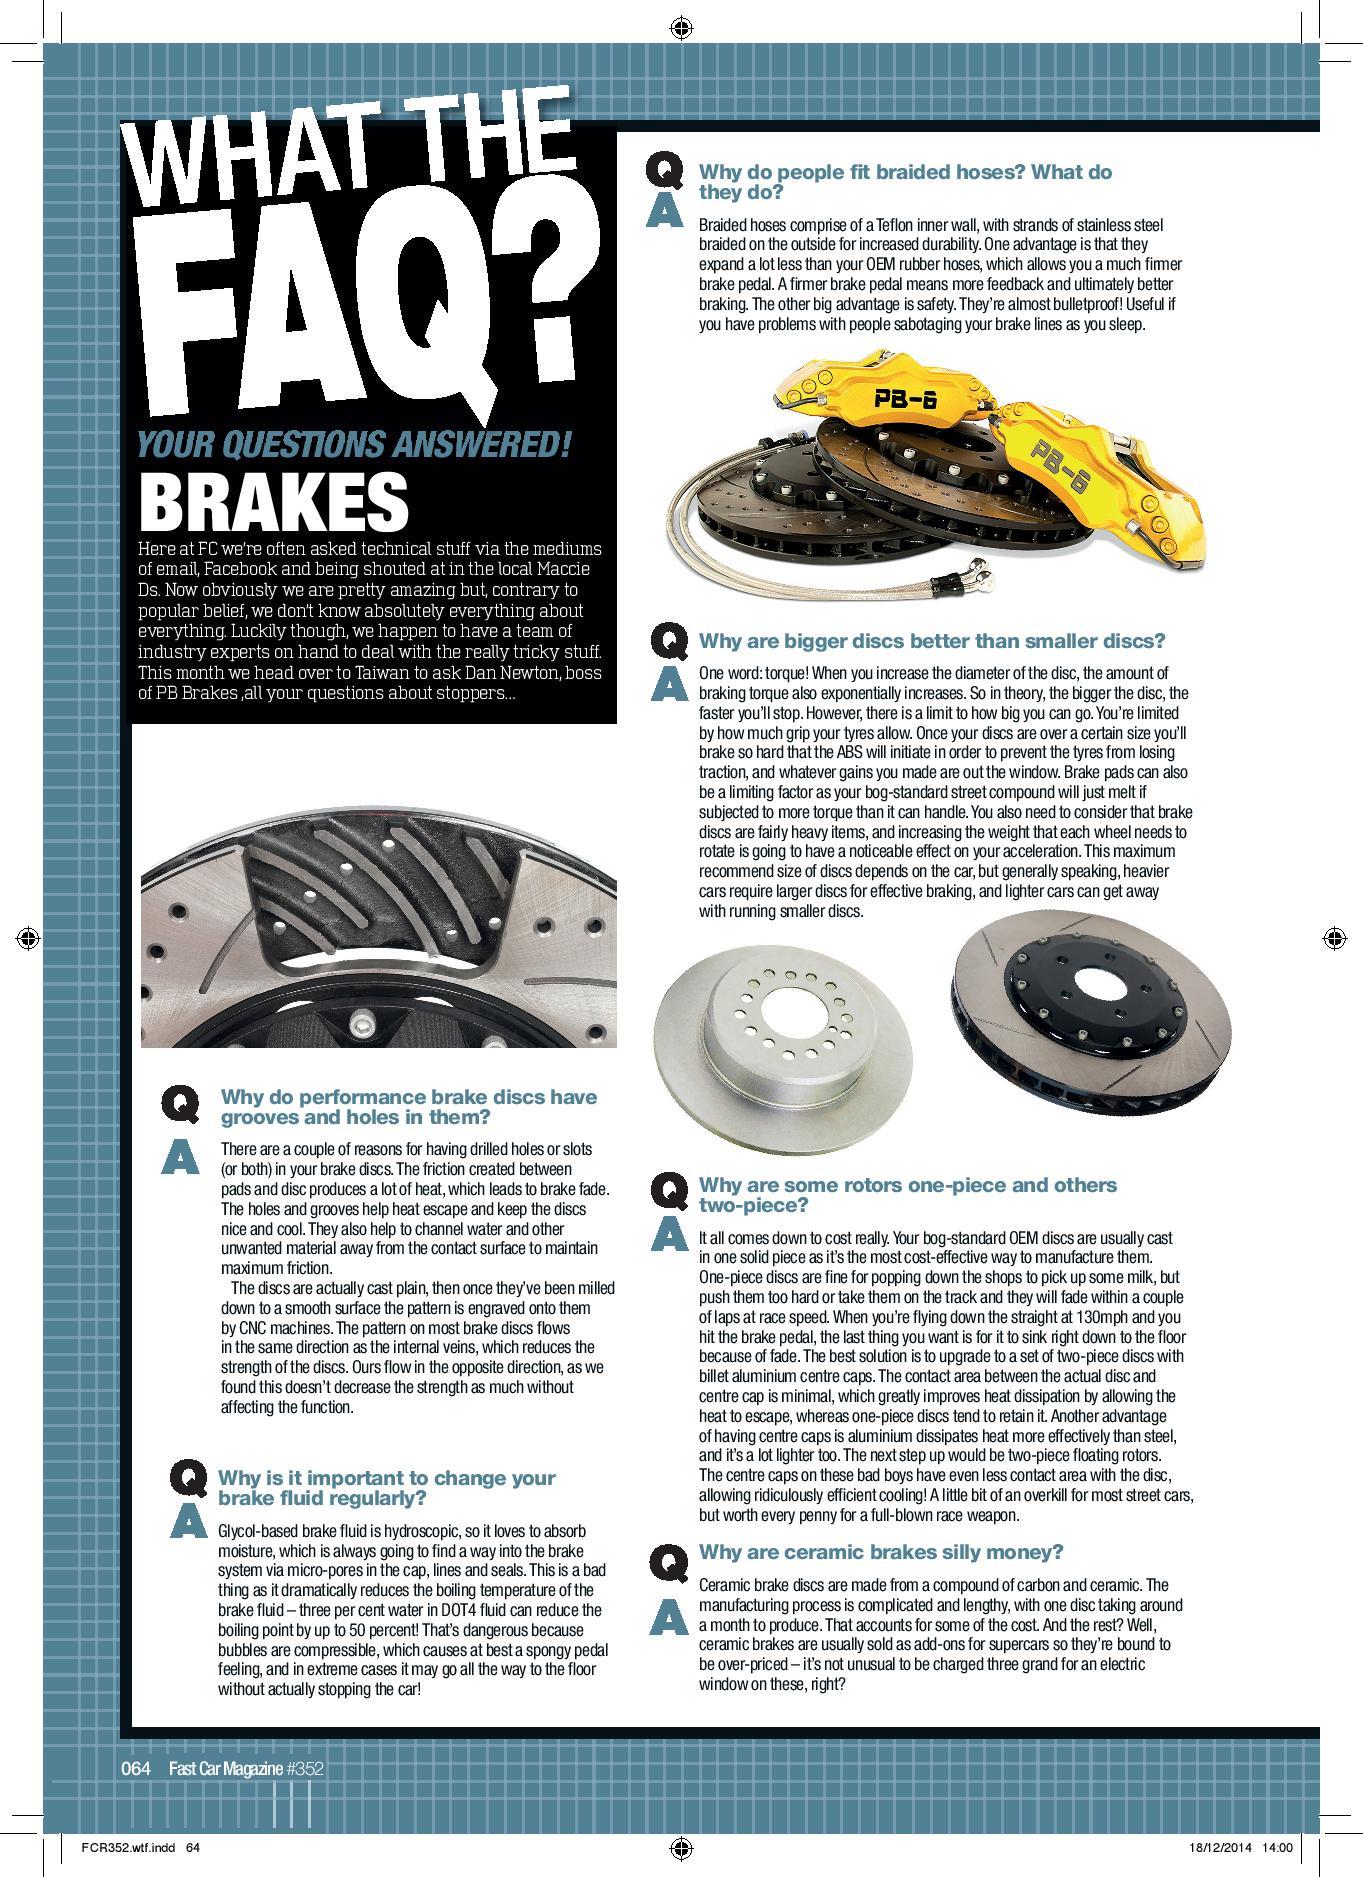 WTFAQ Article by PB Brakes